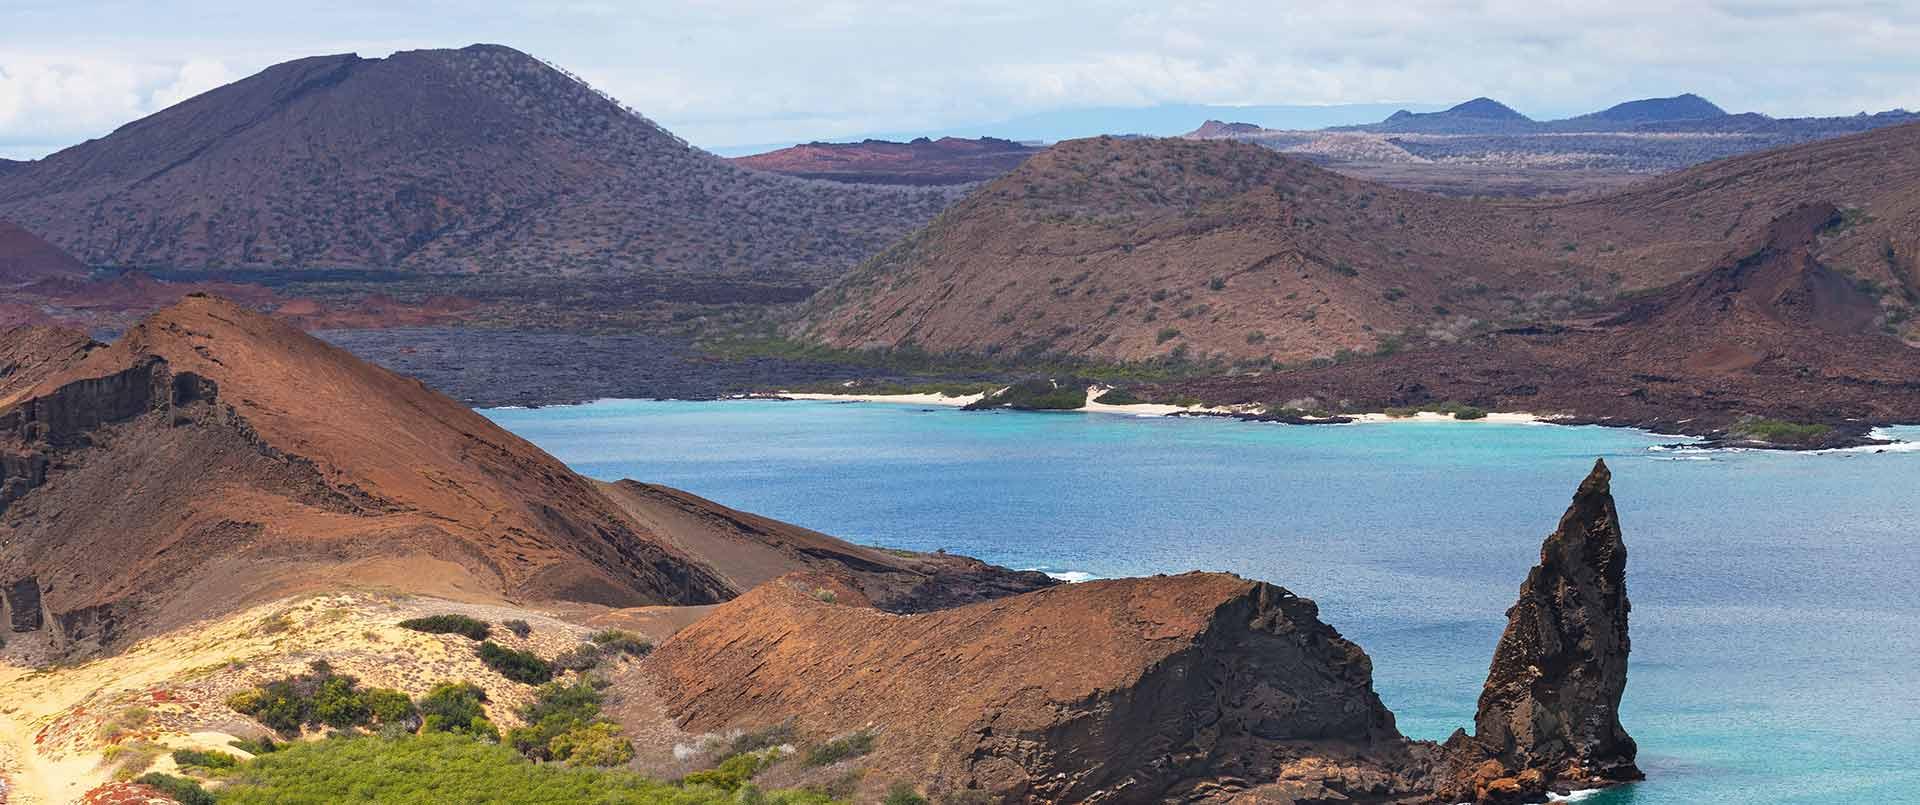 Peru and The Galapagos